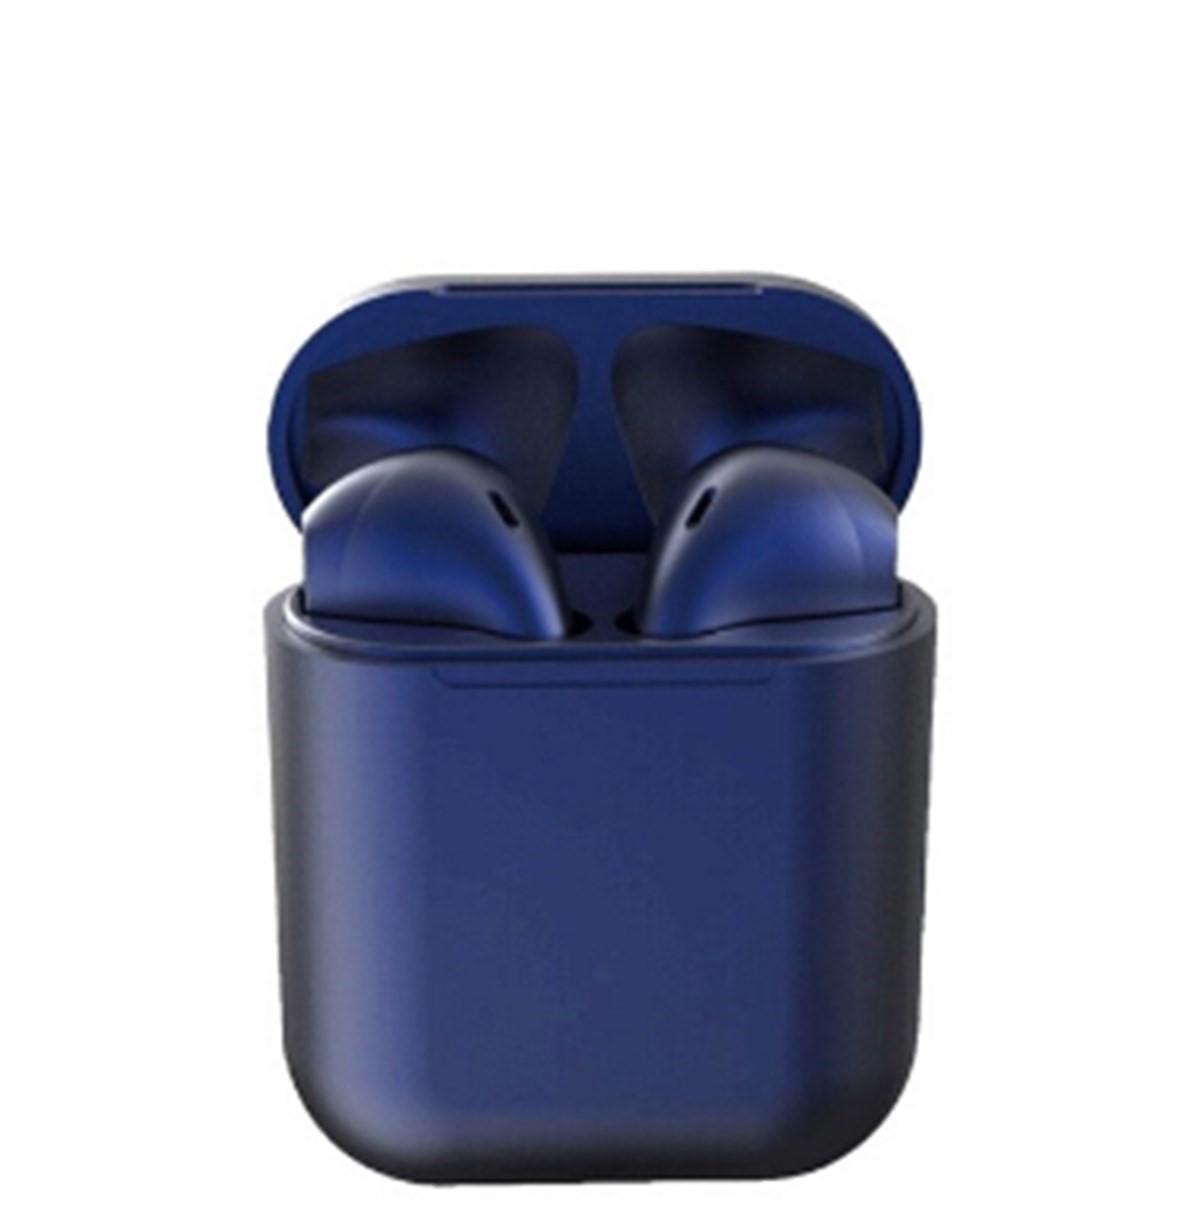 İ12 Tws  Bluetooth Kablosuz Kulaklık Mavi